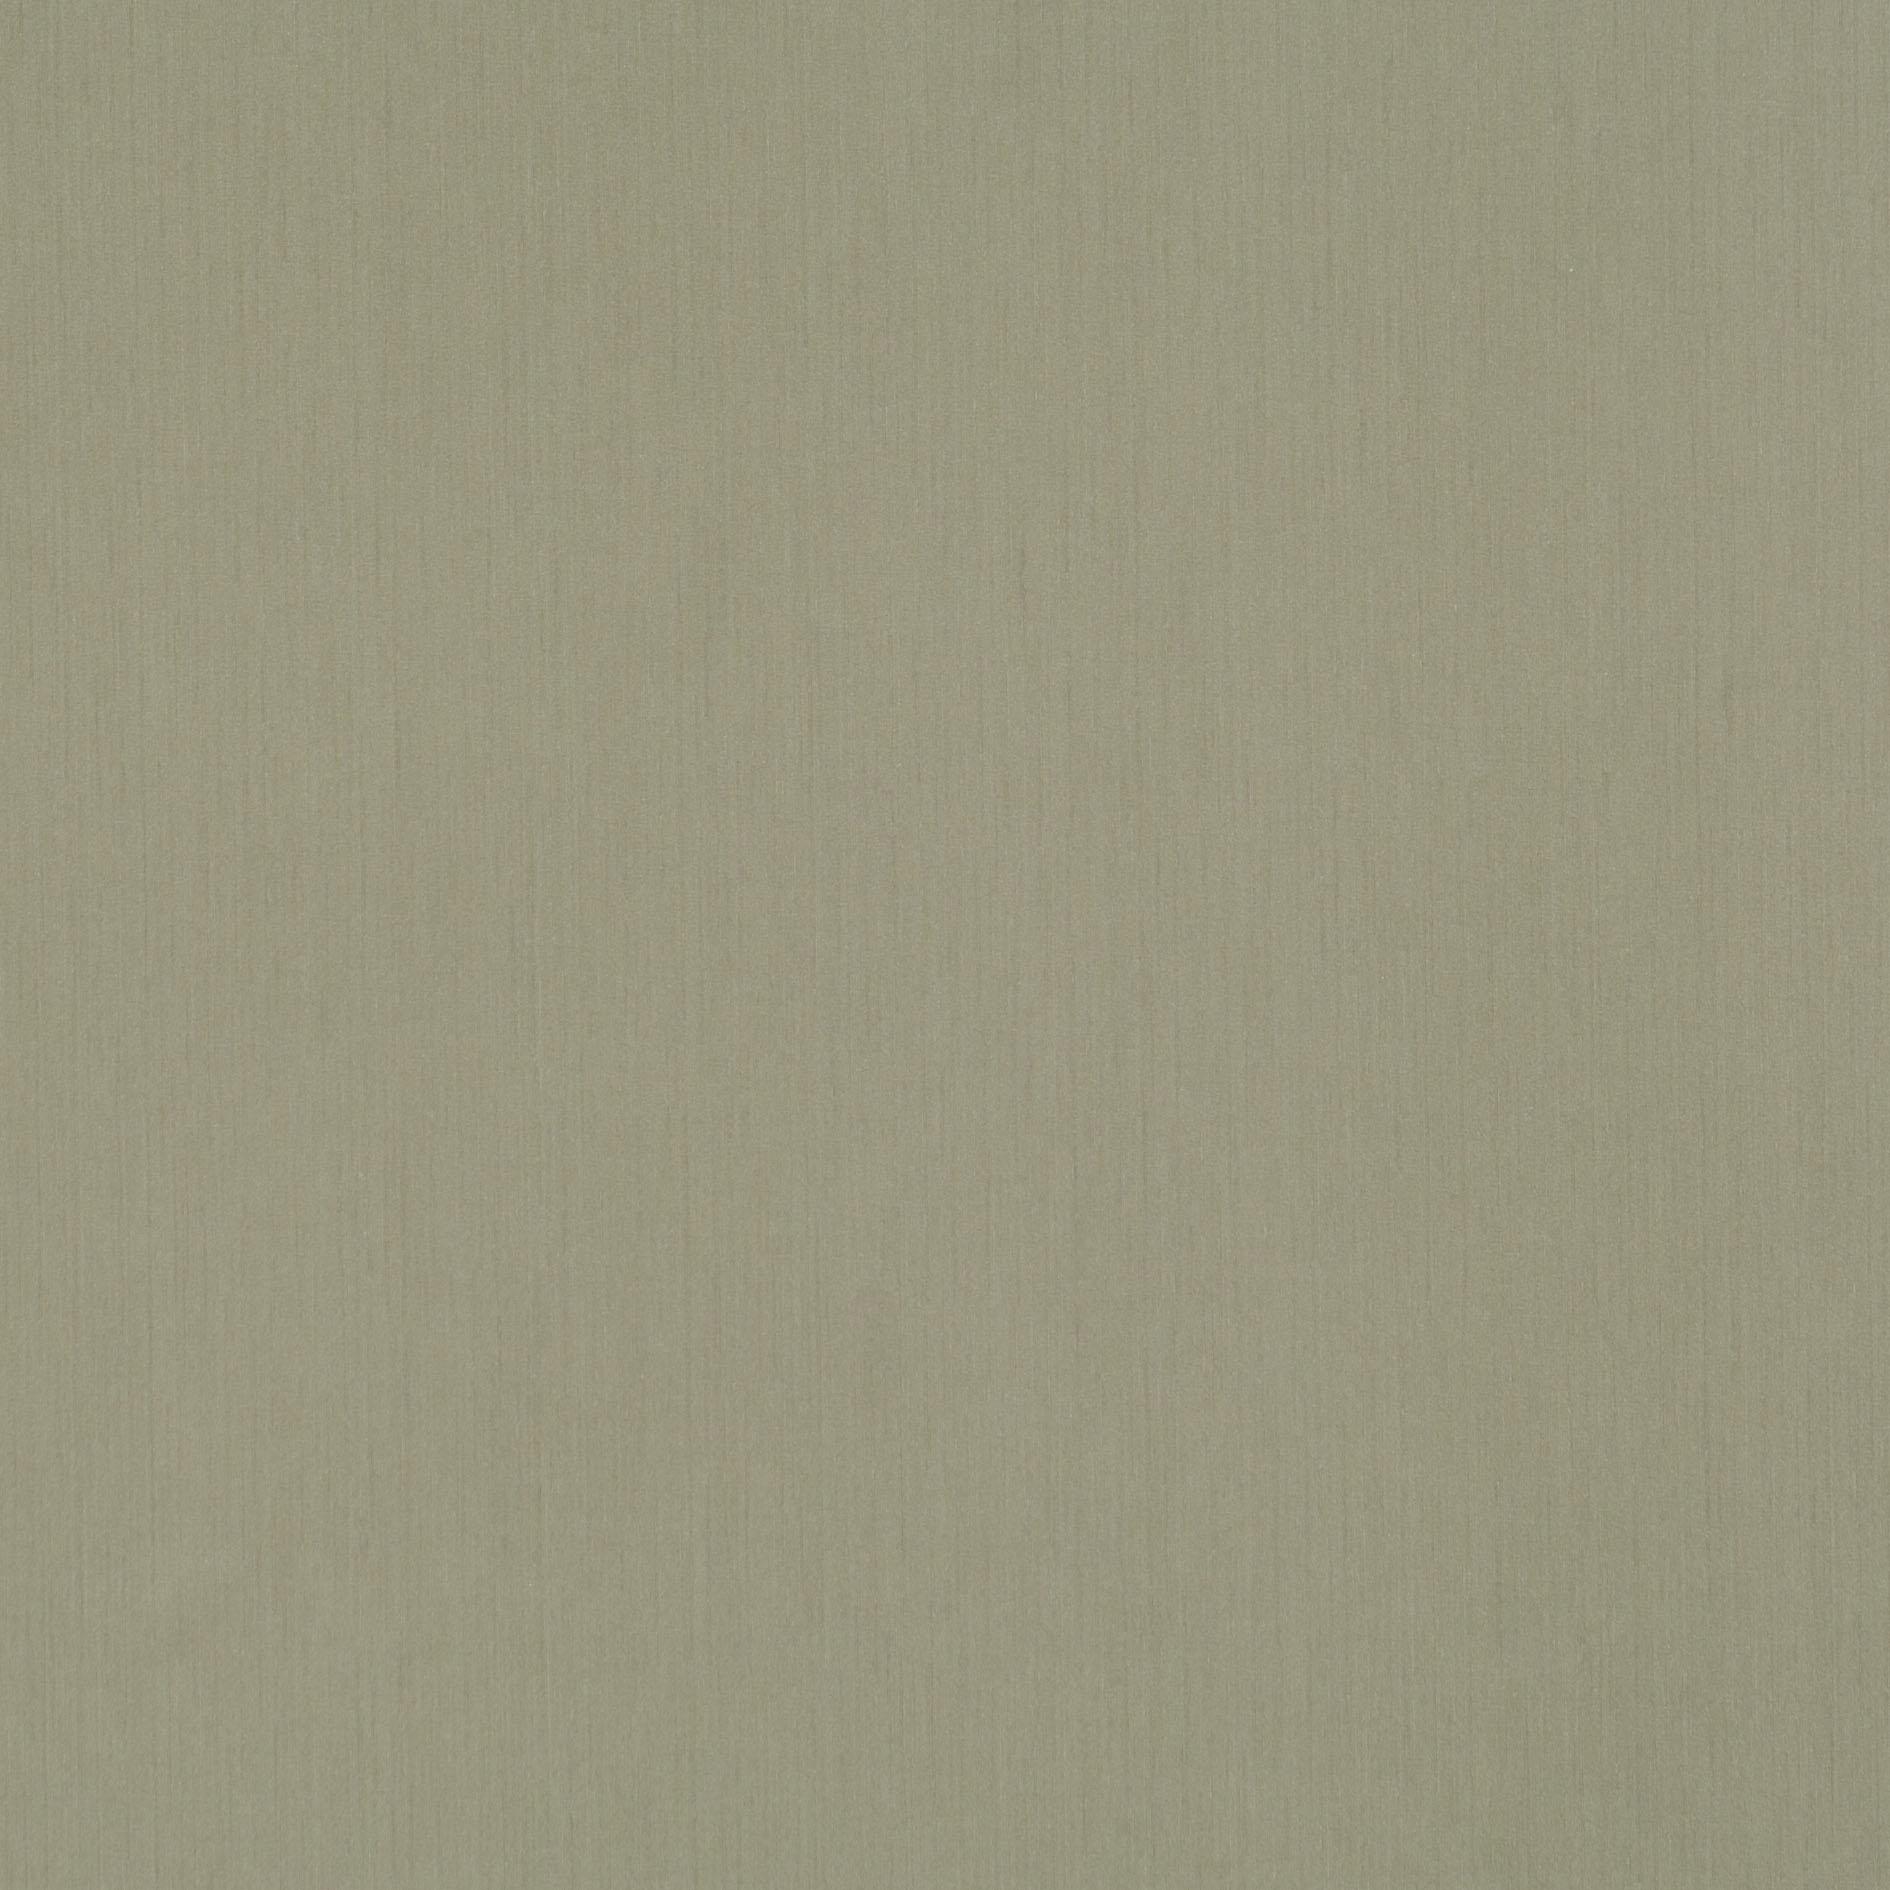 Обои  BN International,  коллекция Colour Line, артикул46790